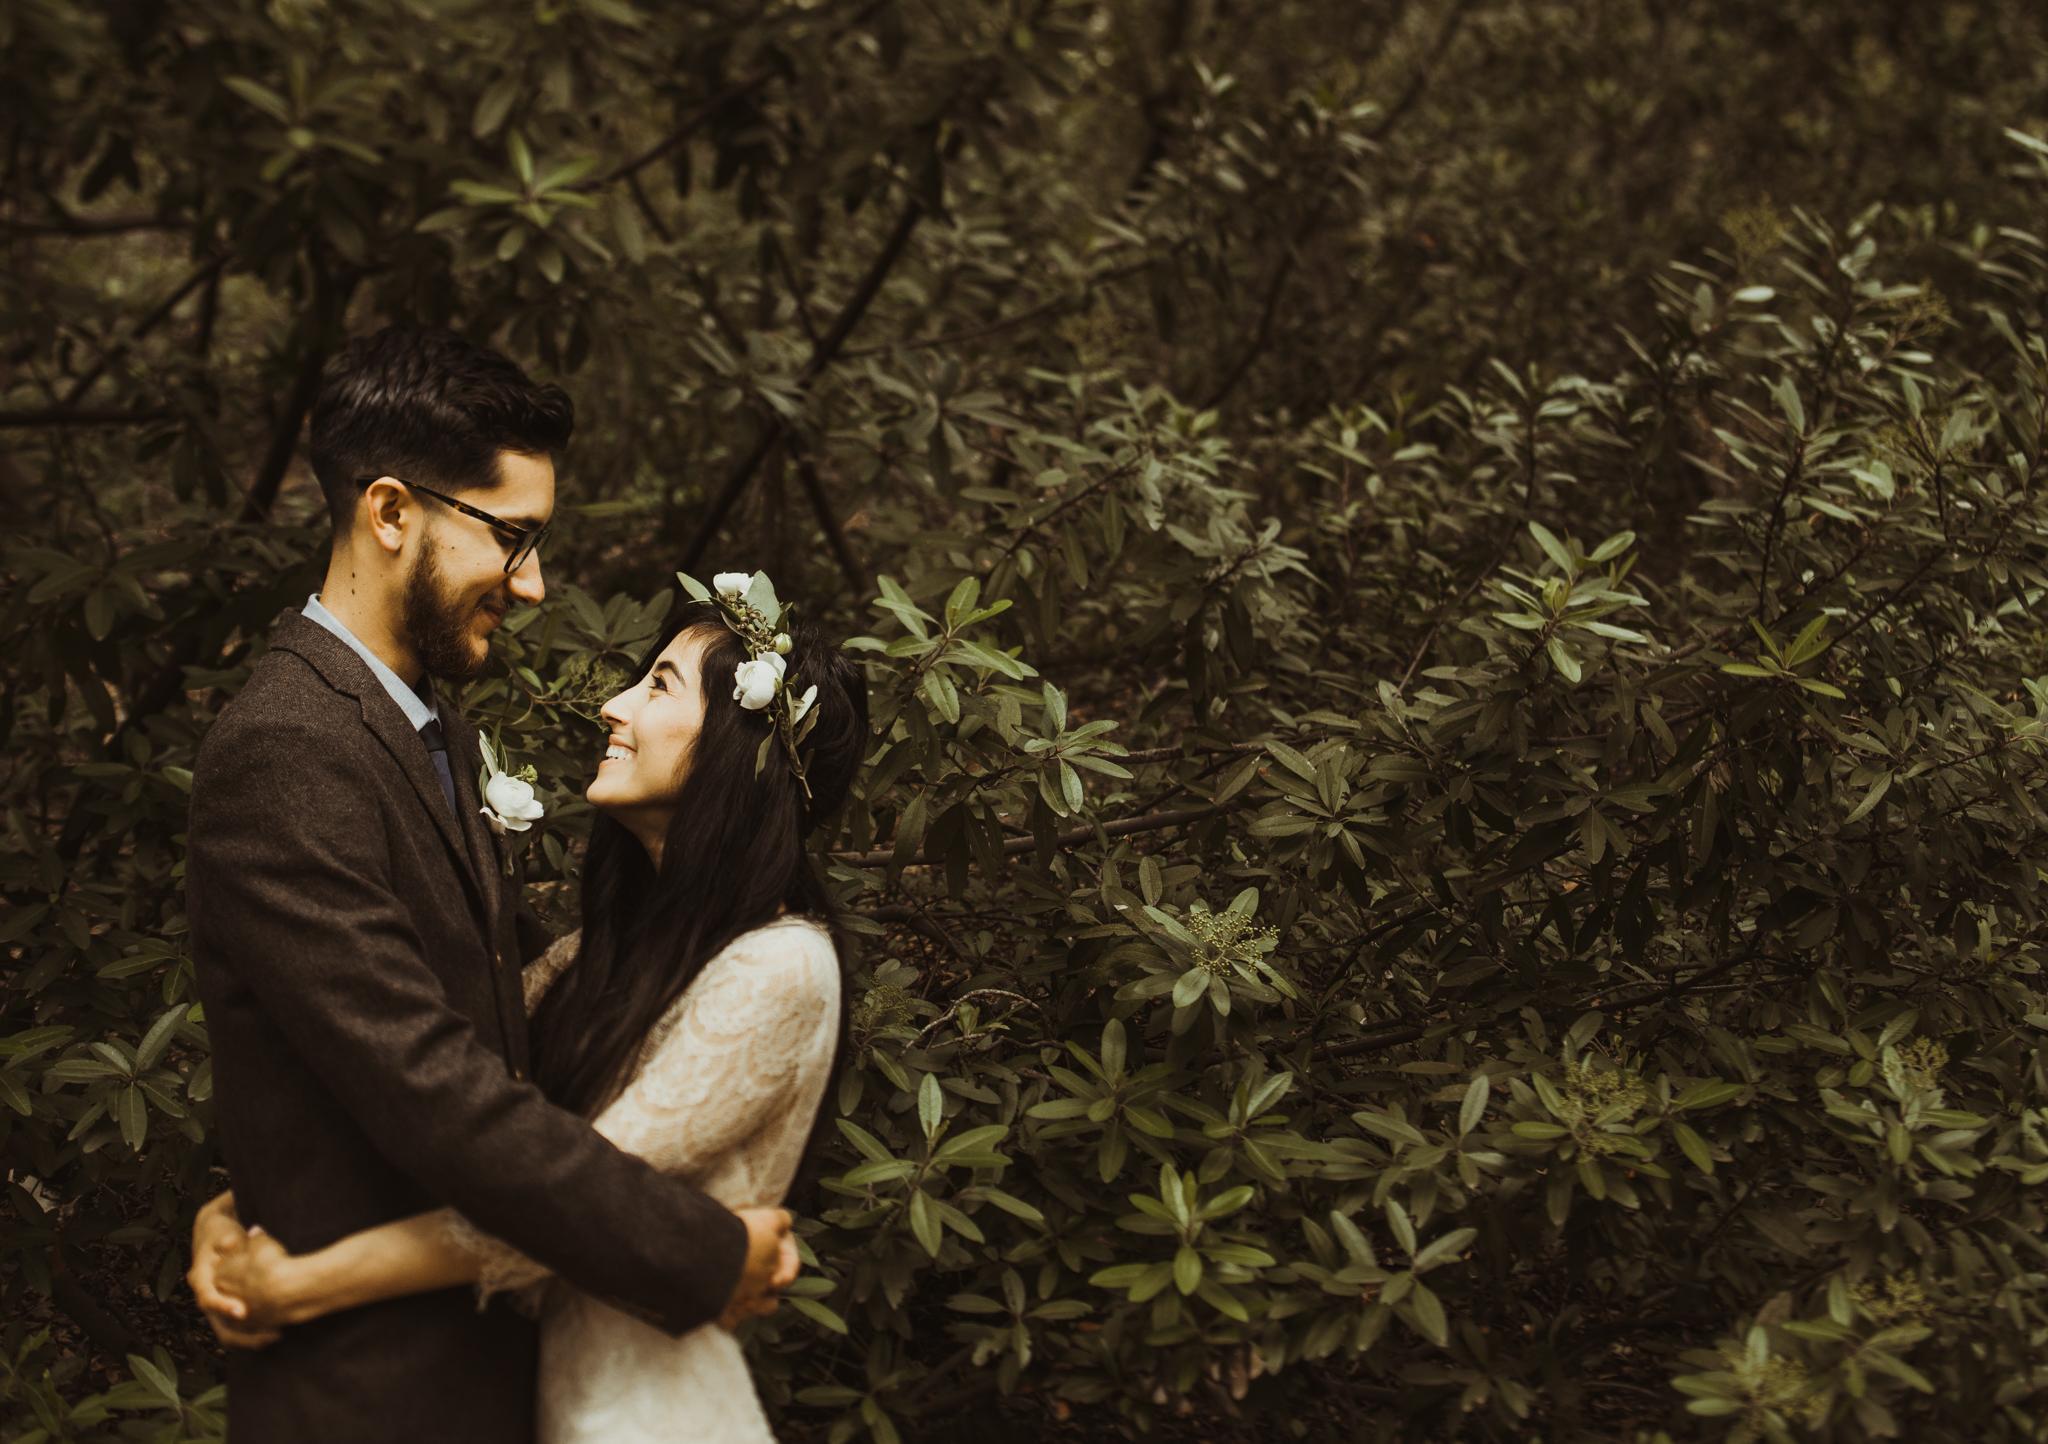 ©Isaiah-&-Taylor-Photography---Oak-Canyon-Nature-Center-Wedding,-Anaheim-Hills-030.jpg